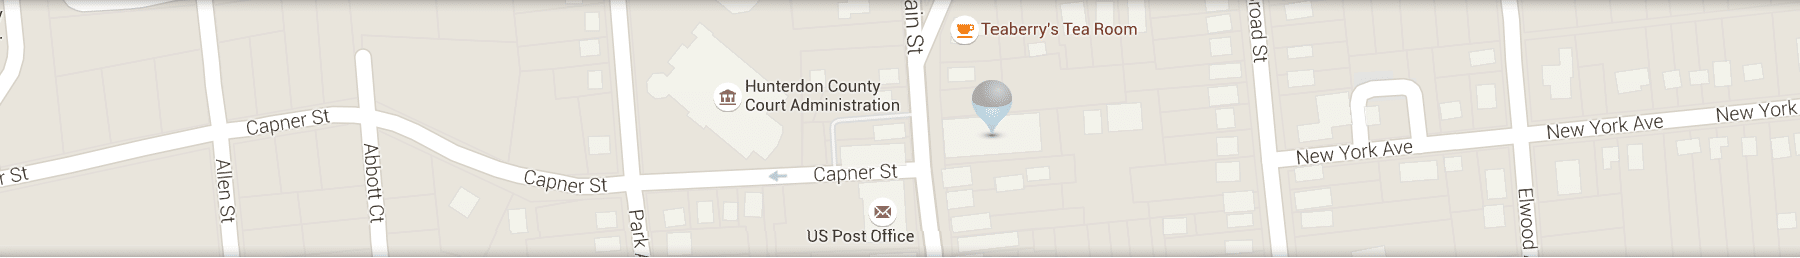 Location Map Graphic at Cedarbaum Orthodontics at Flemington NJ